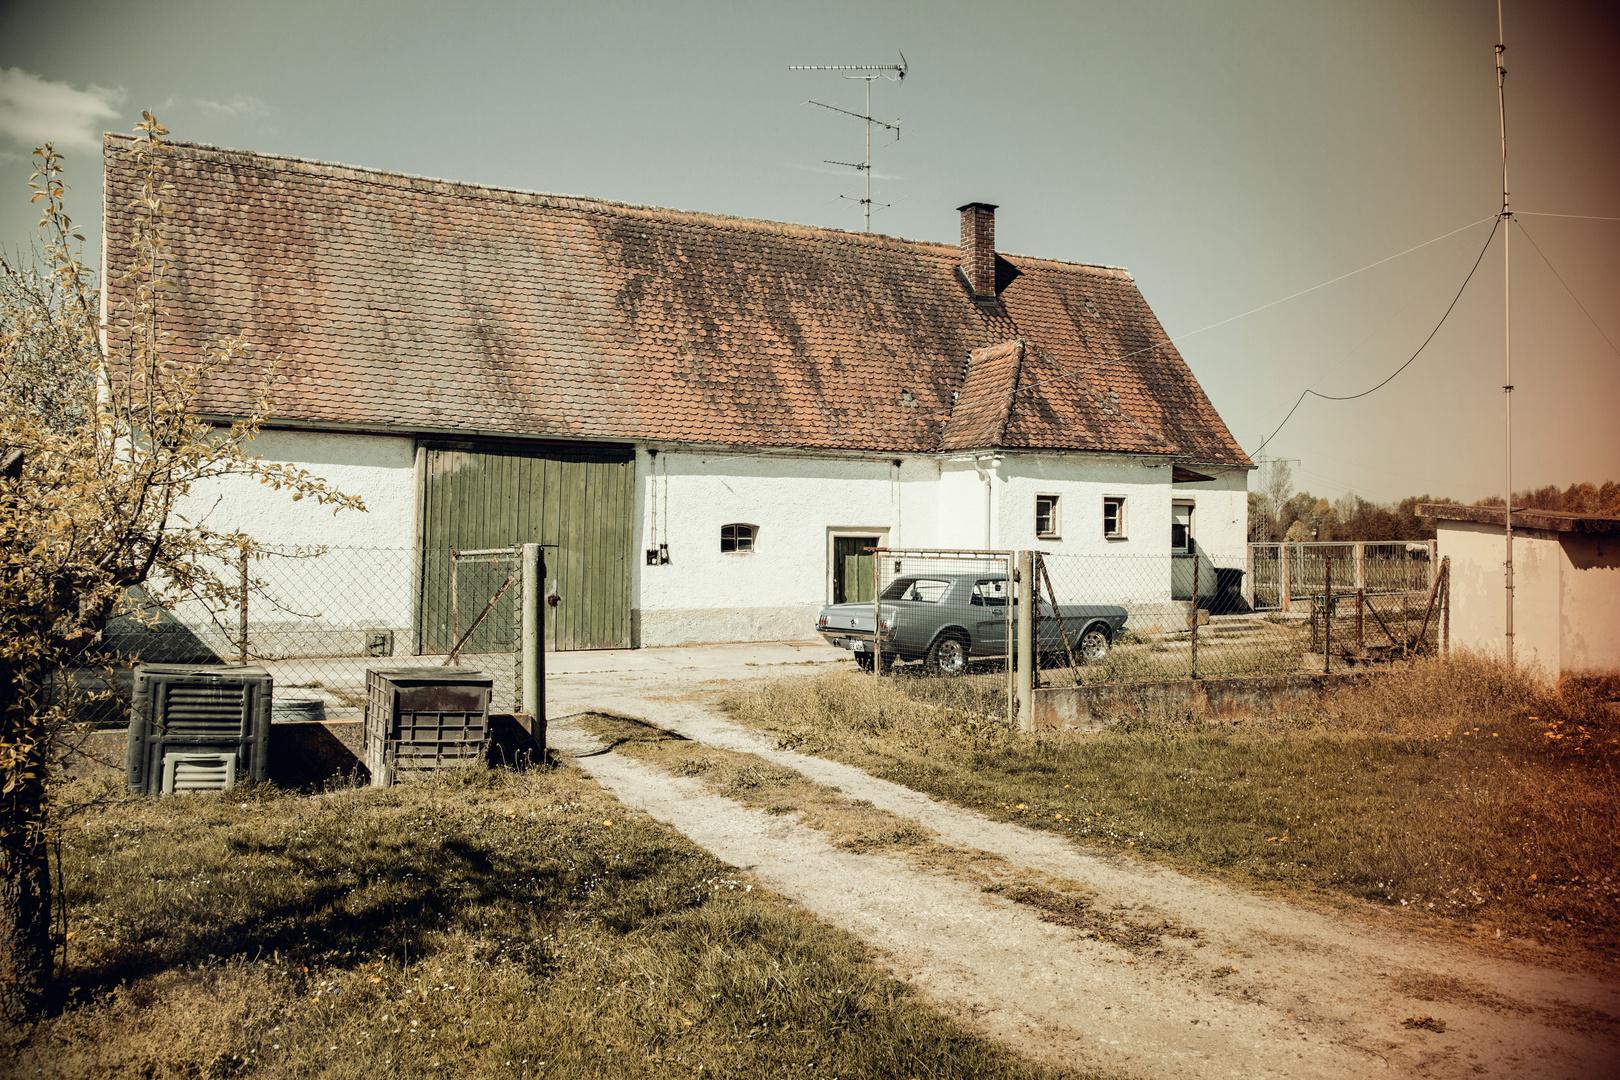 Mustang in a Farm